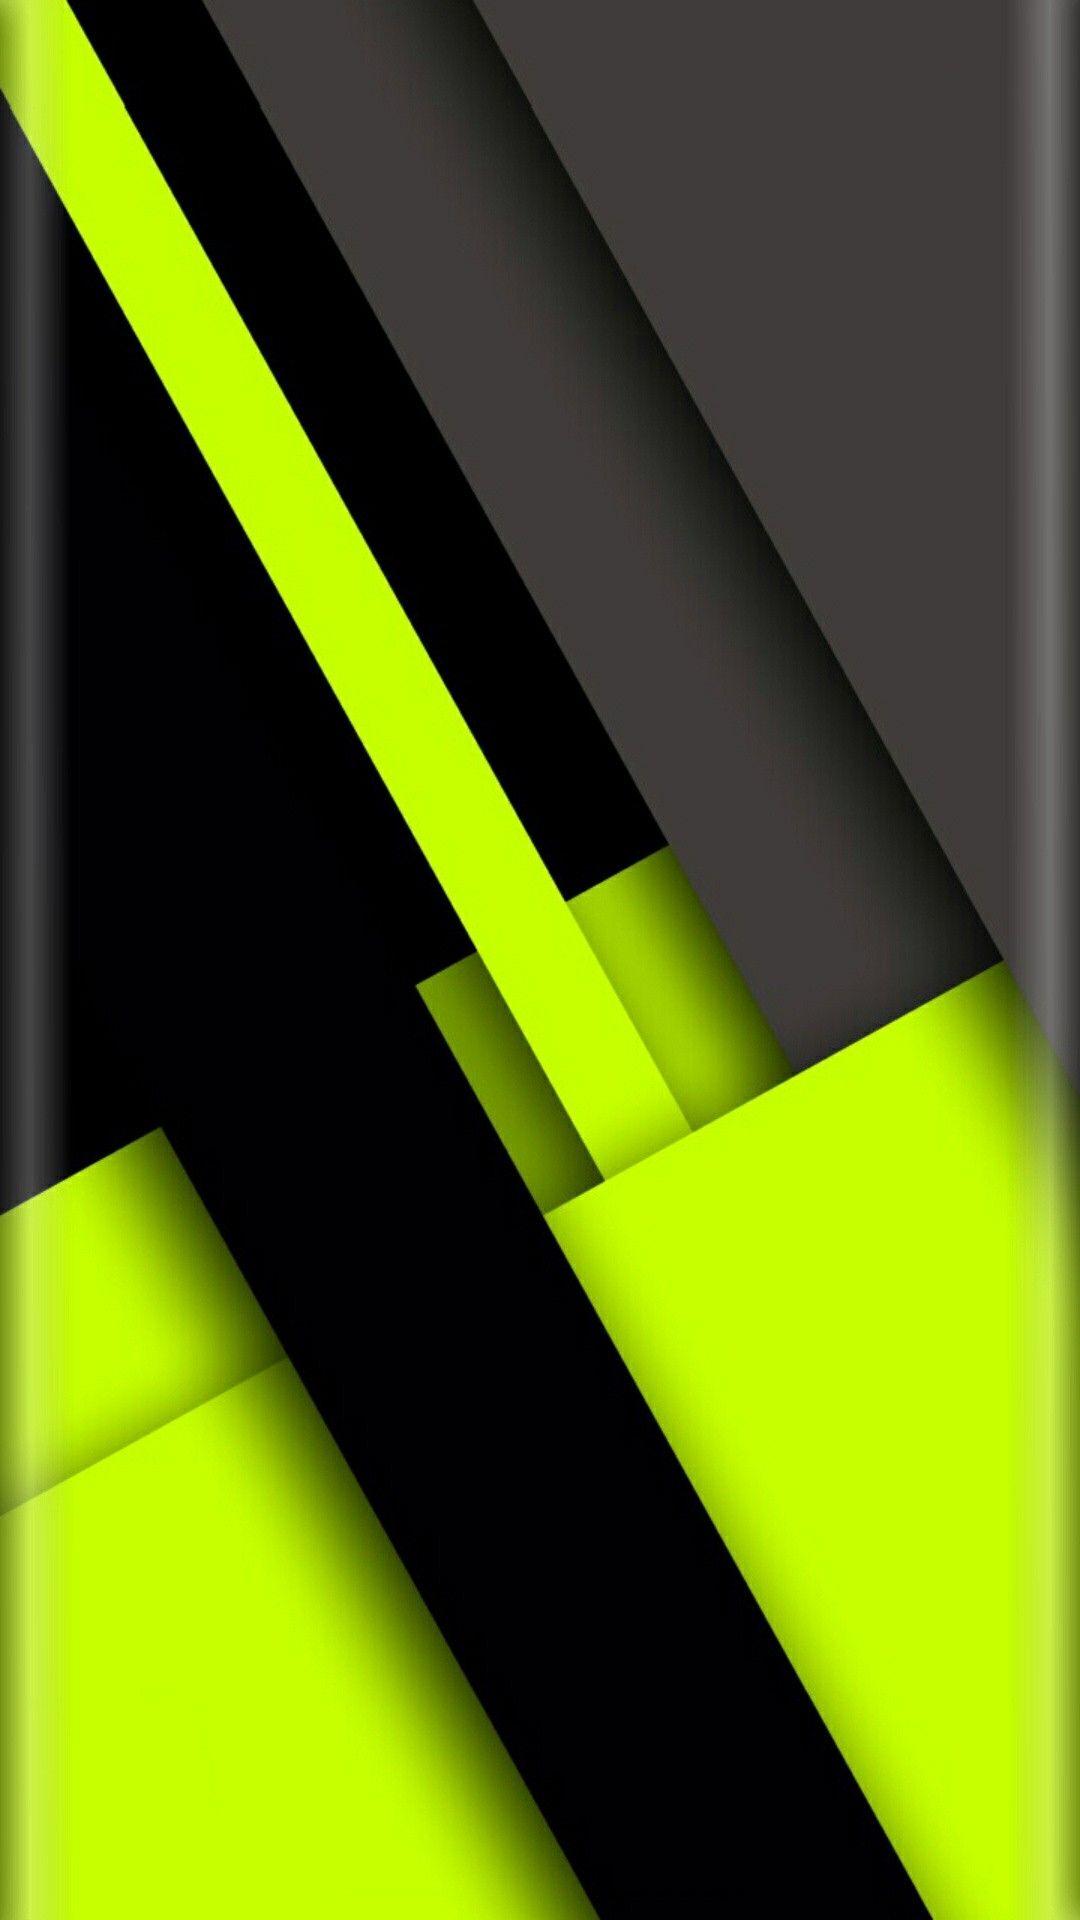 Pin By Kartik Kumar On Wallpapers Realtree Wallpaper Android